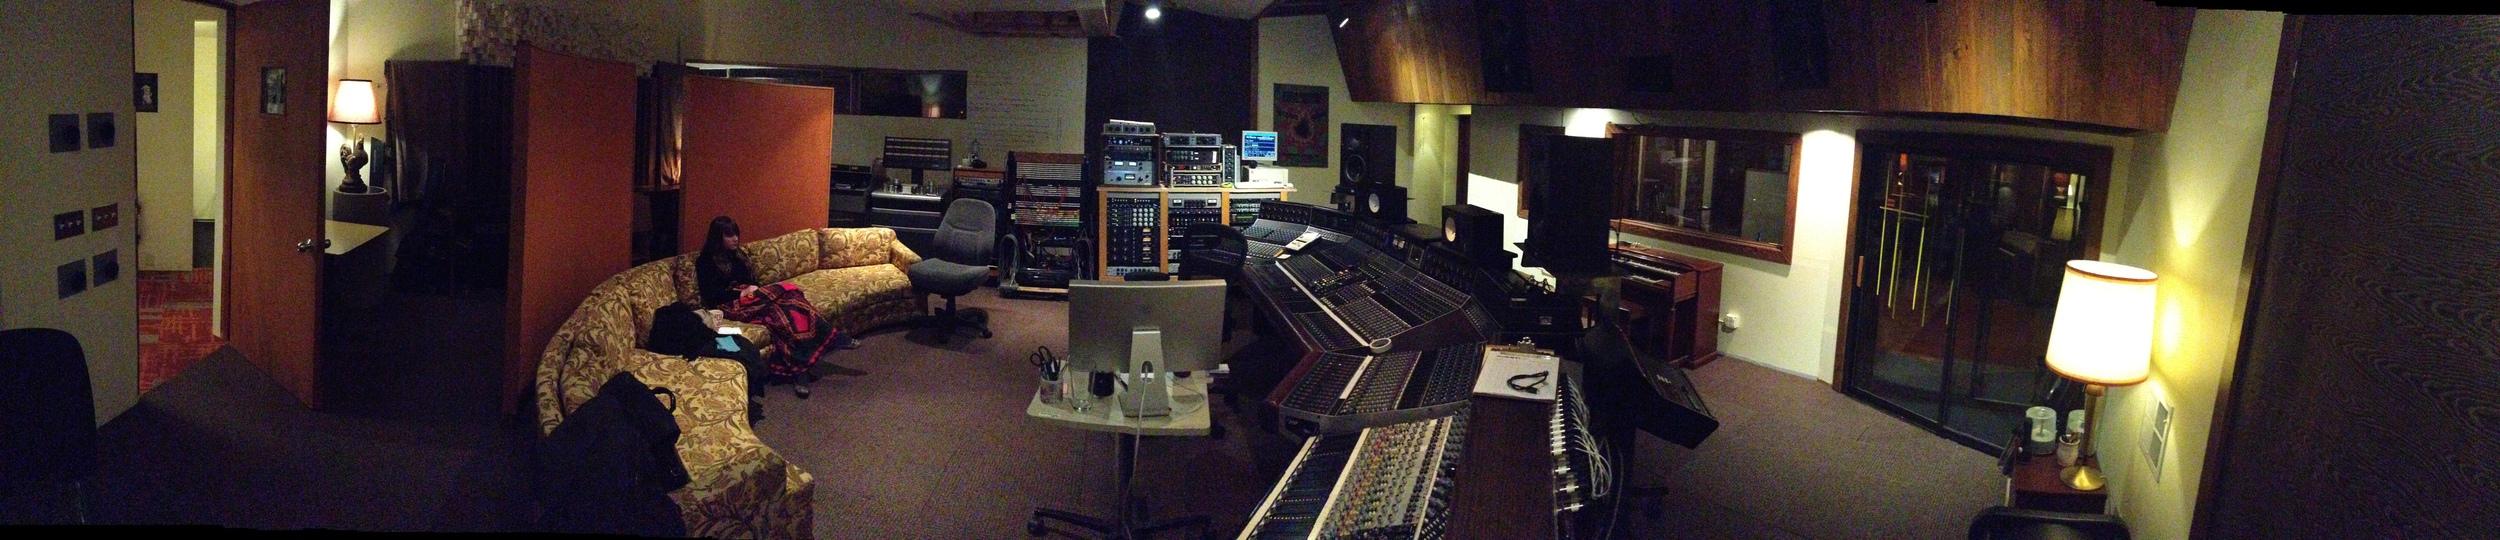 Janelat AVAST! Studio Bin Seattle, WA mixingMellow Diamond.